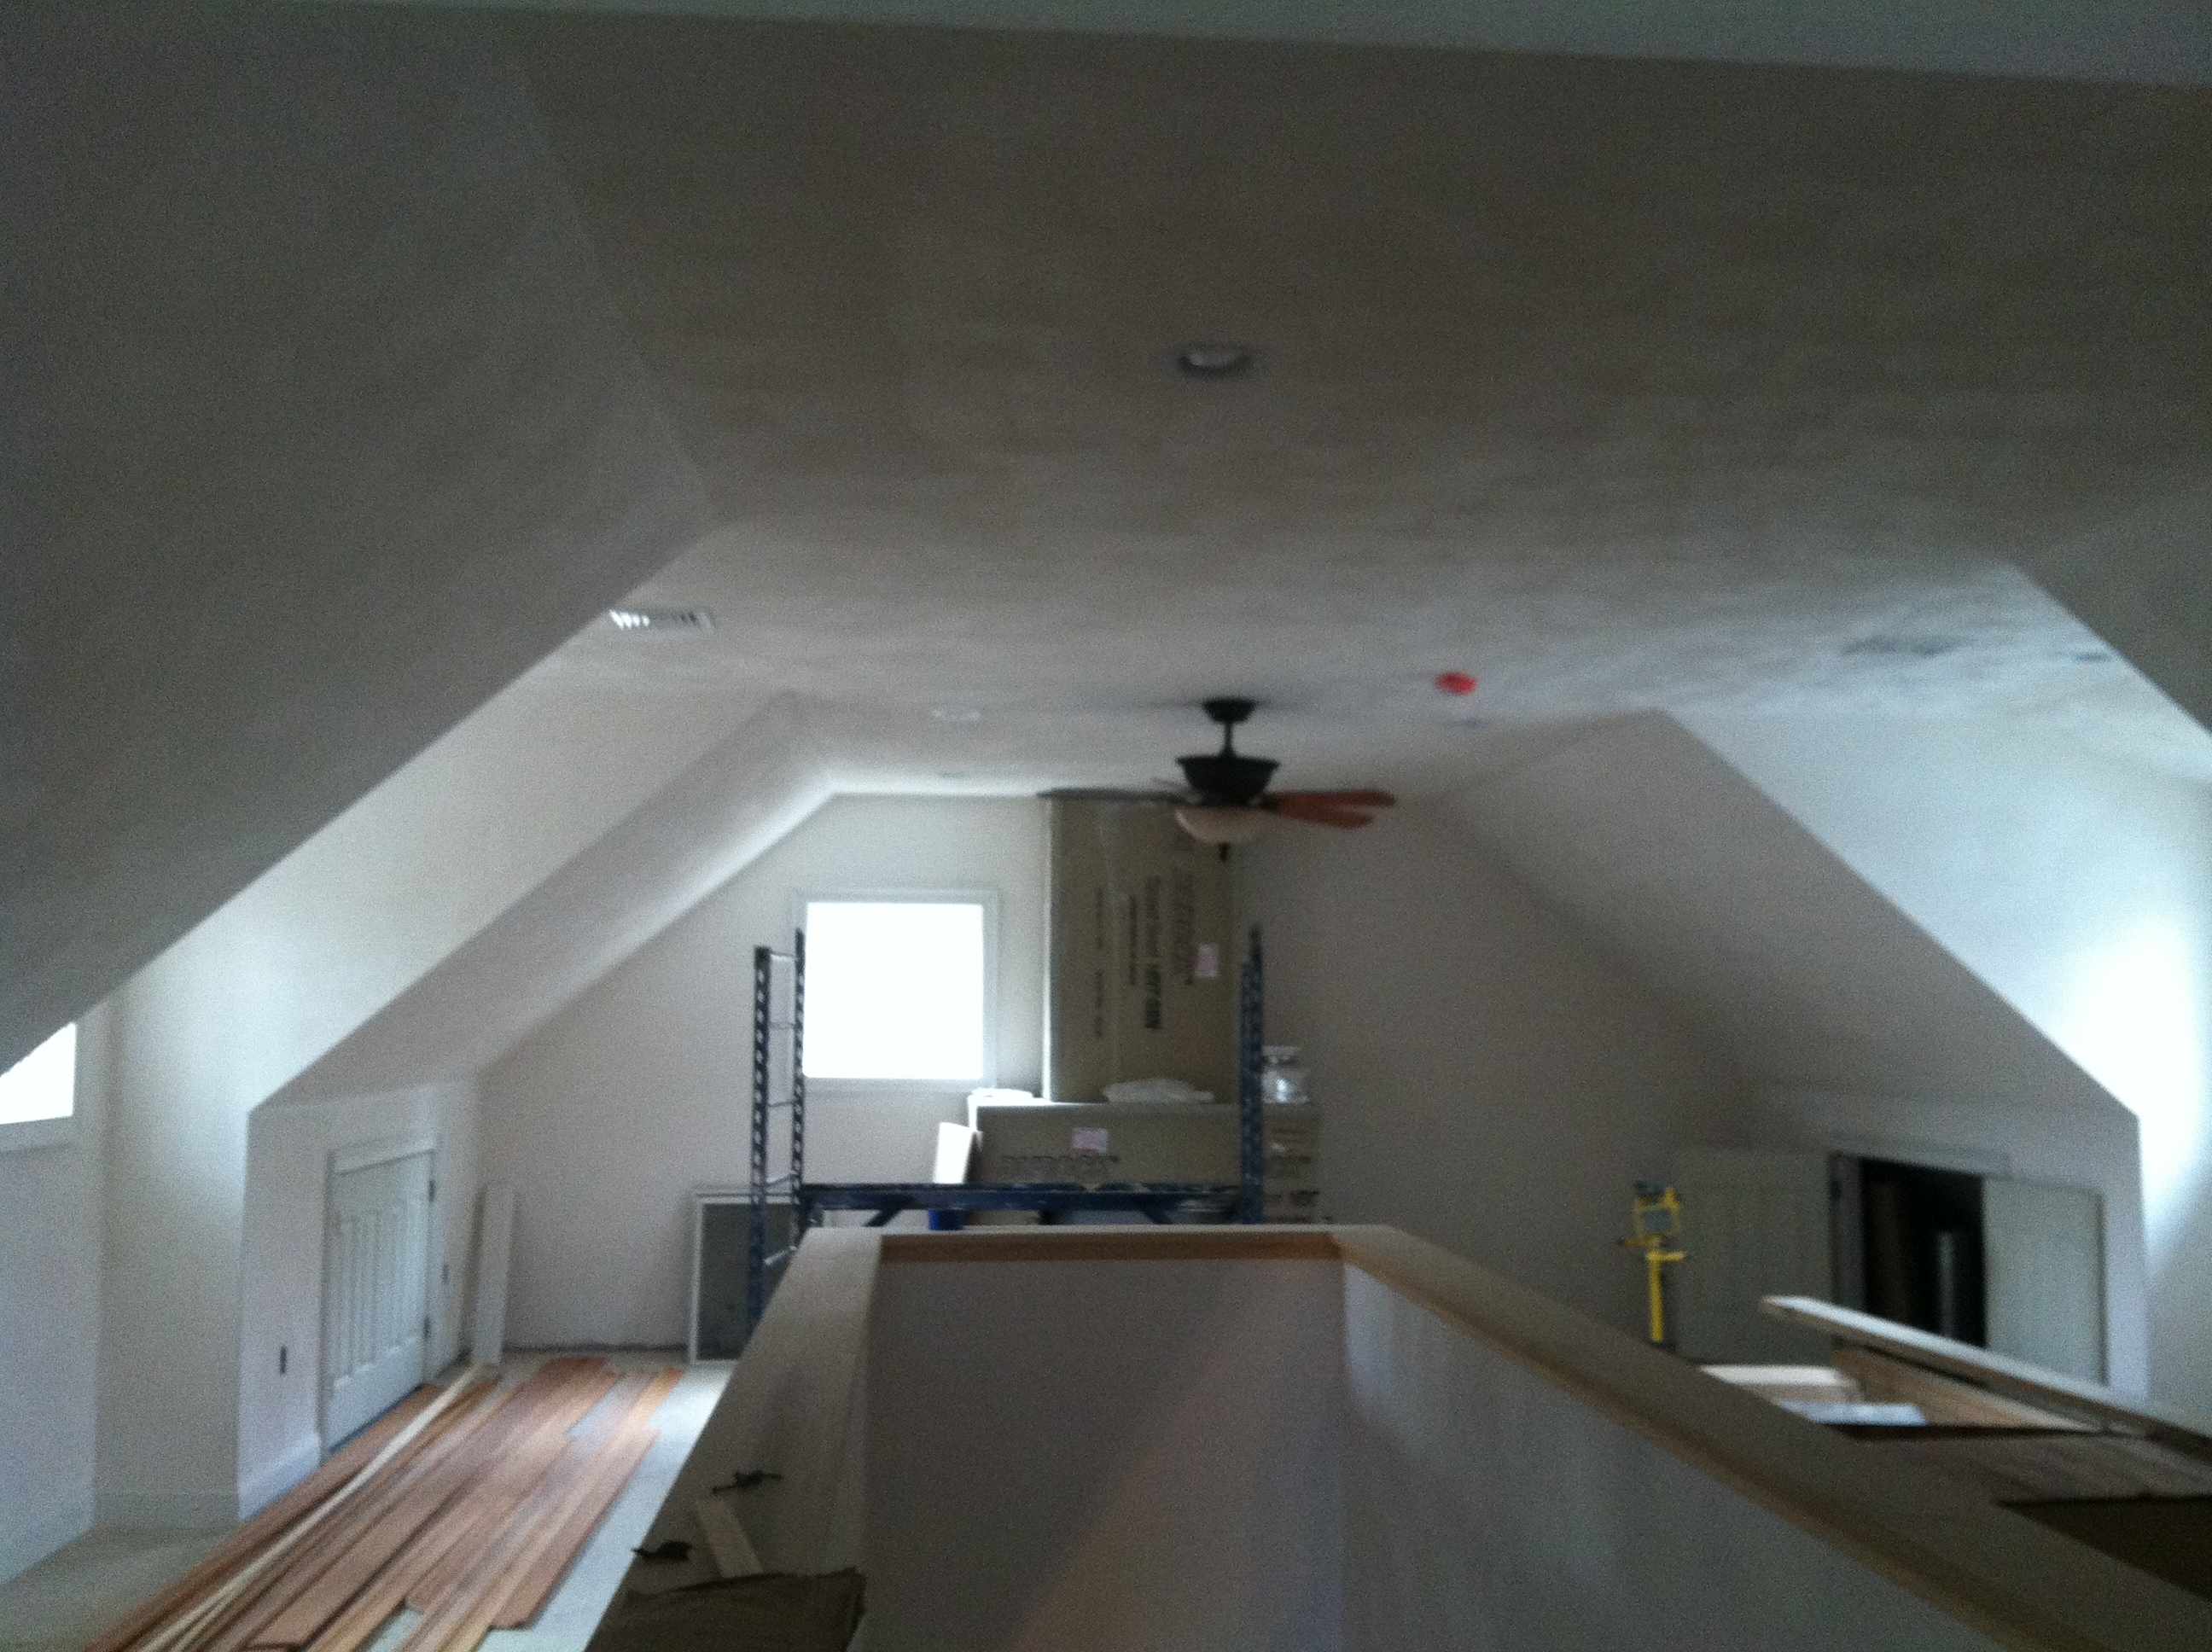 Renfro Plastering Contracting image 1